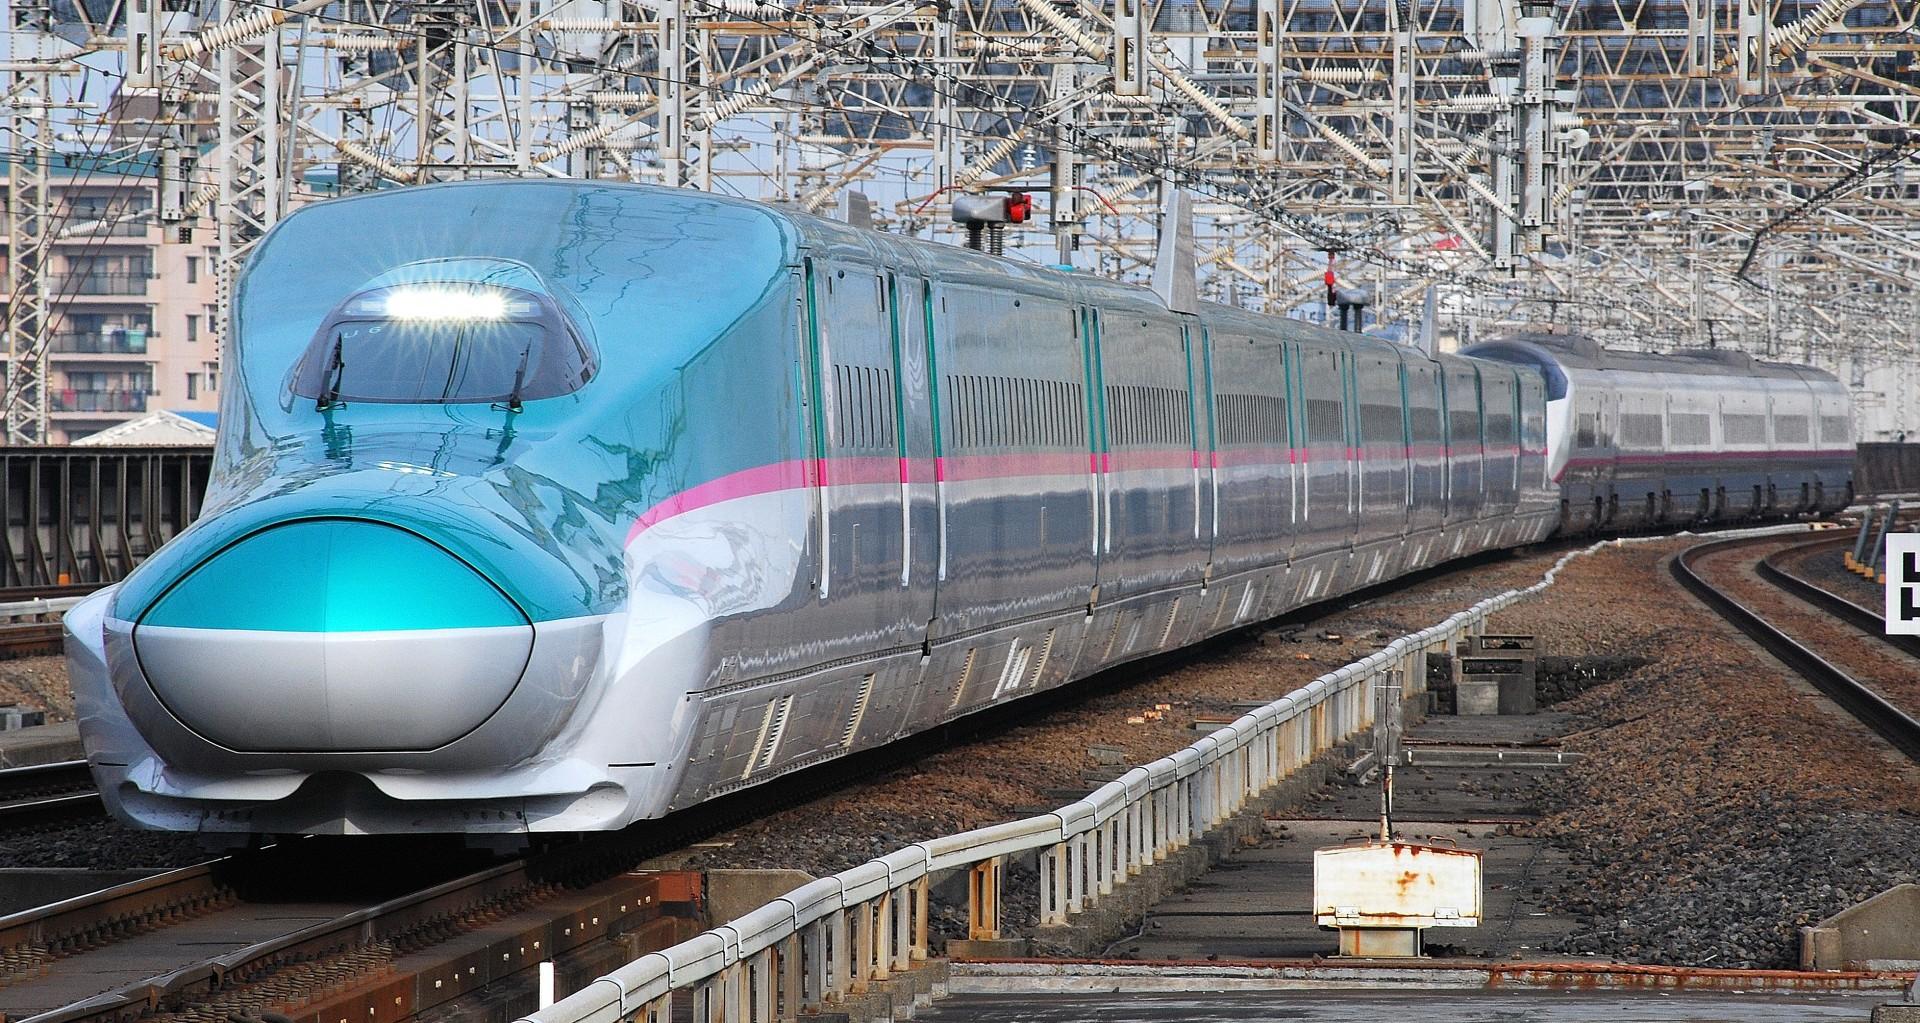 Imagen del Shinkansen E5 de JR East, base del Shinkansen H5.